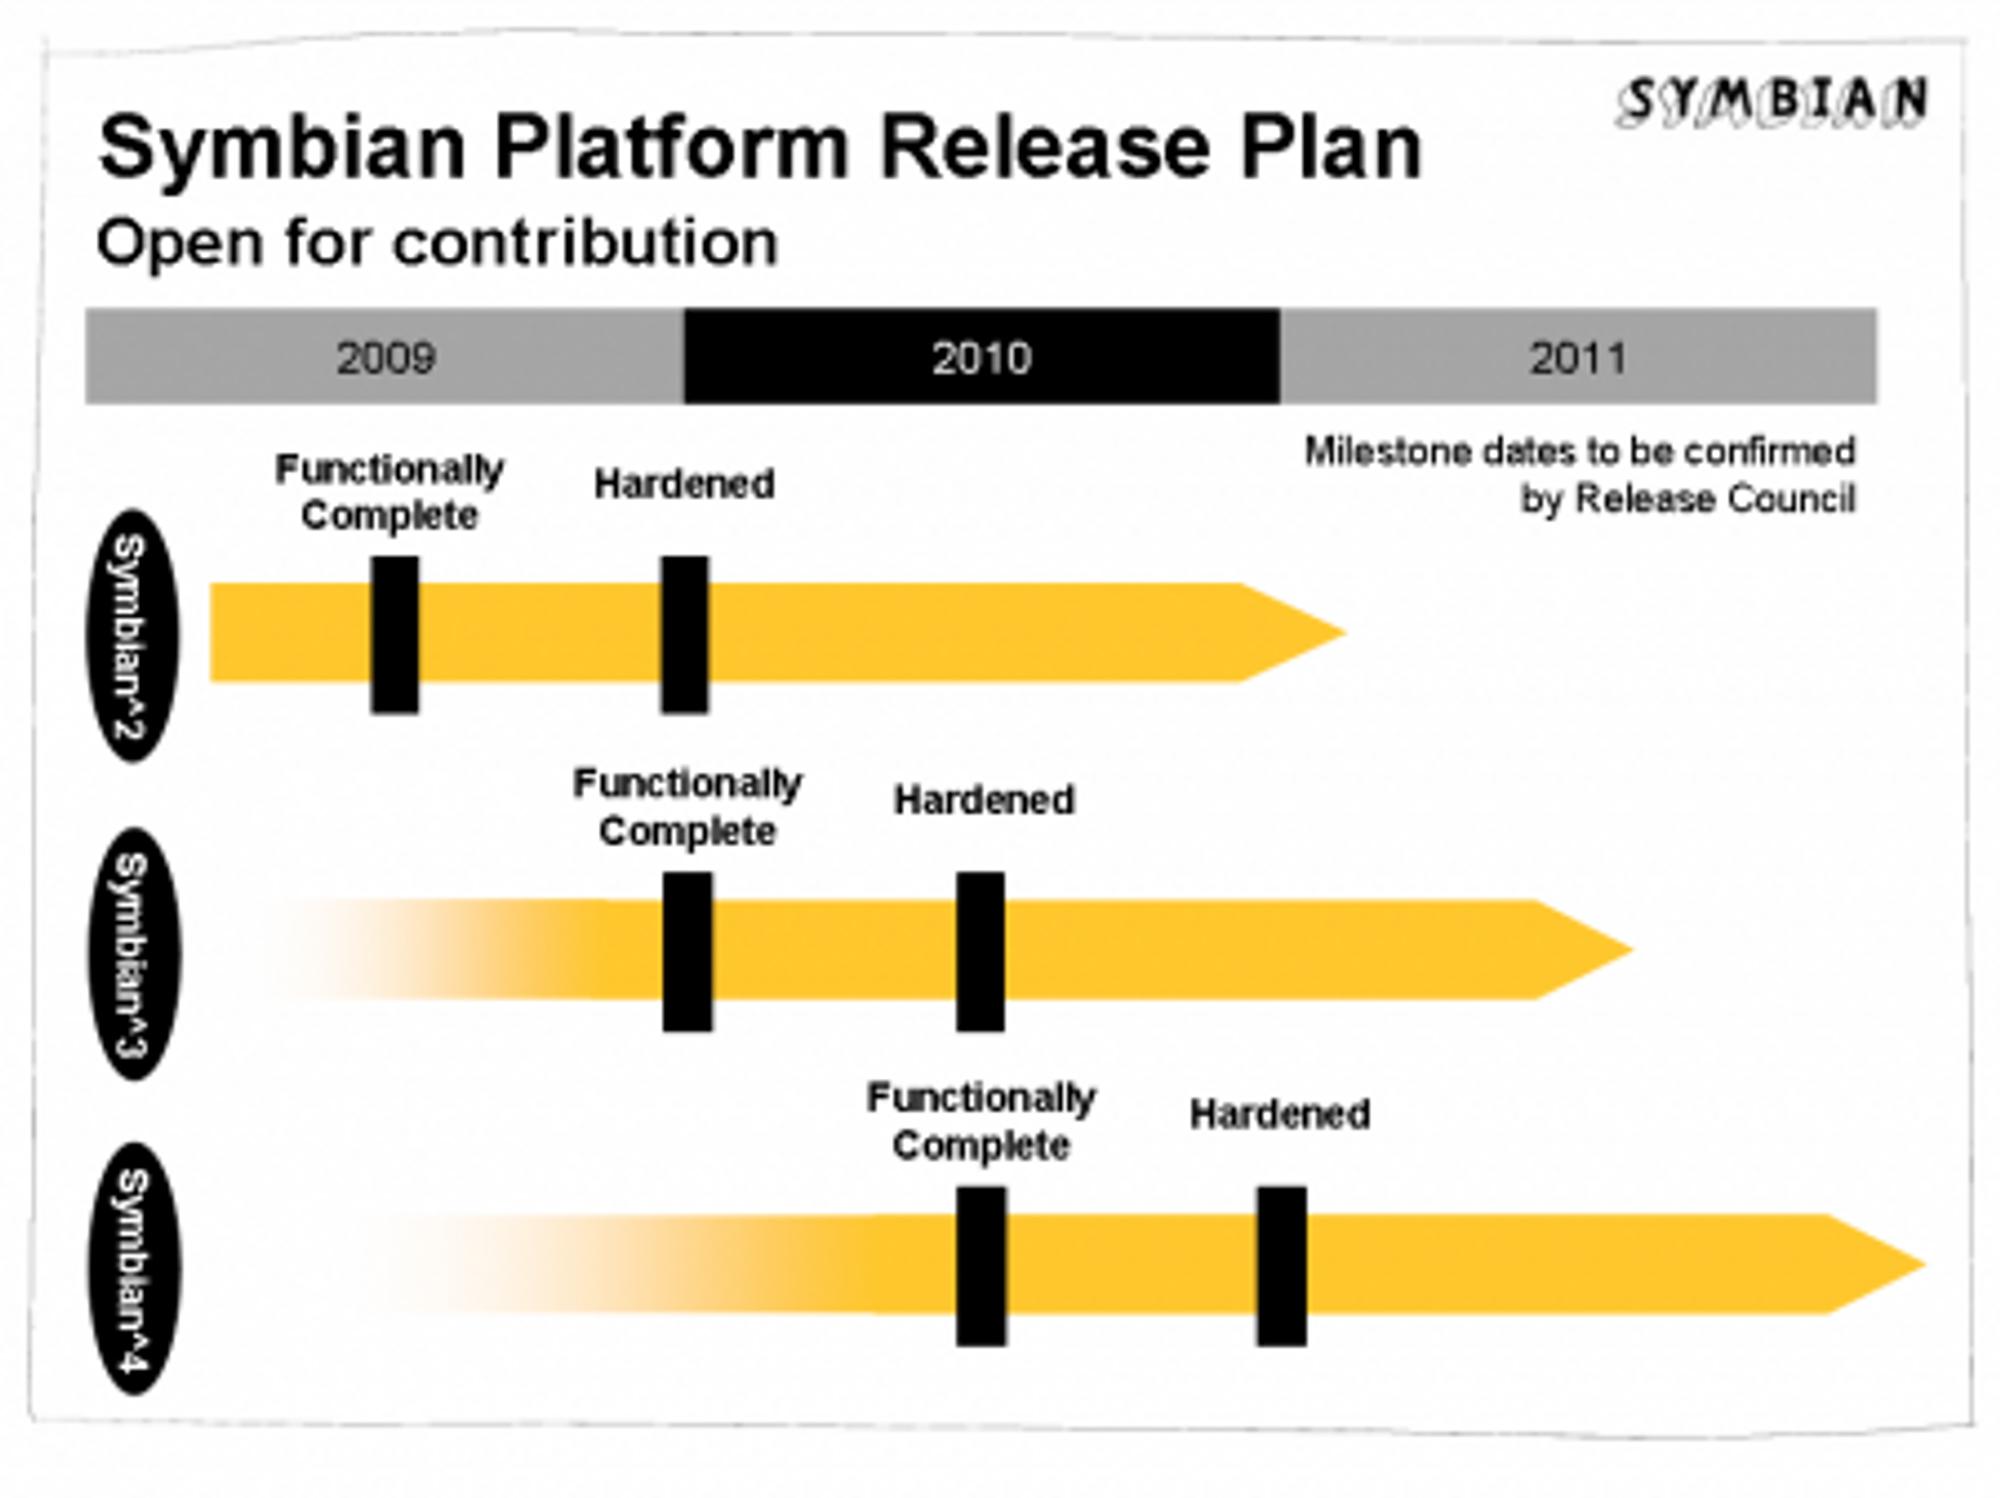 Veikart for Symbian Platform.